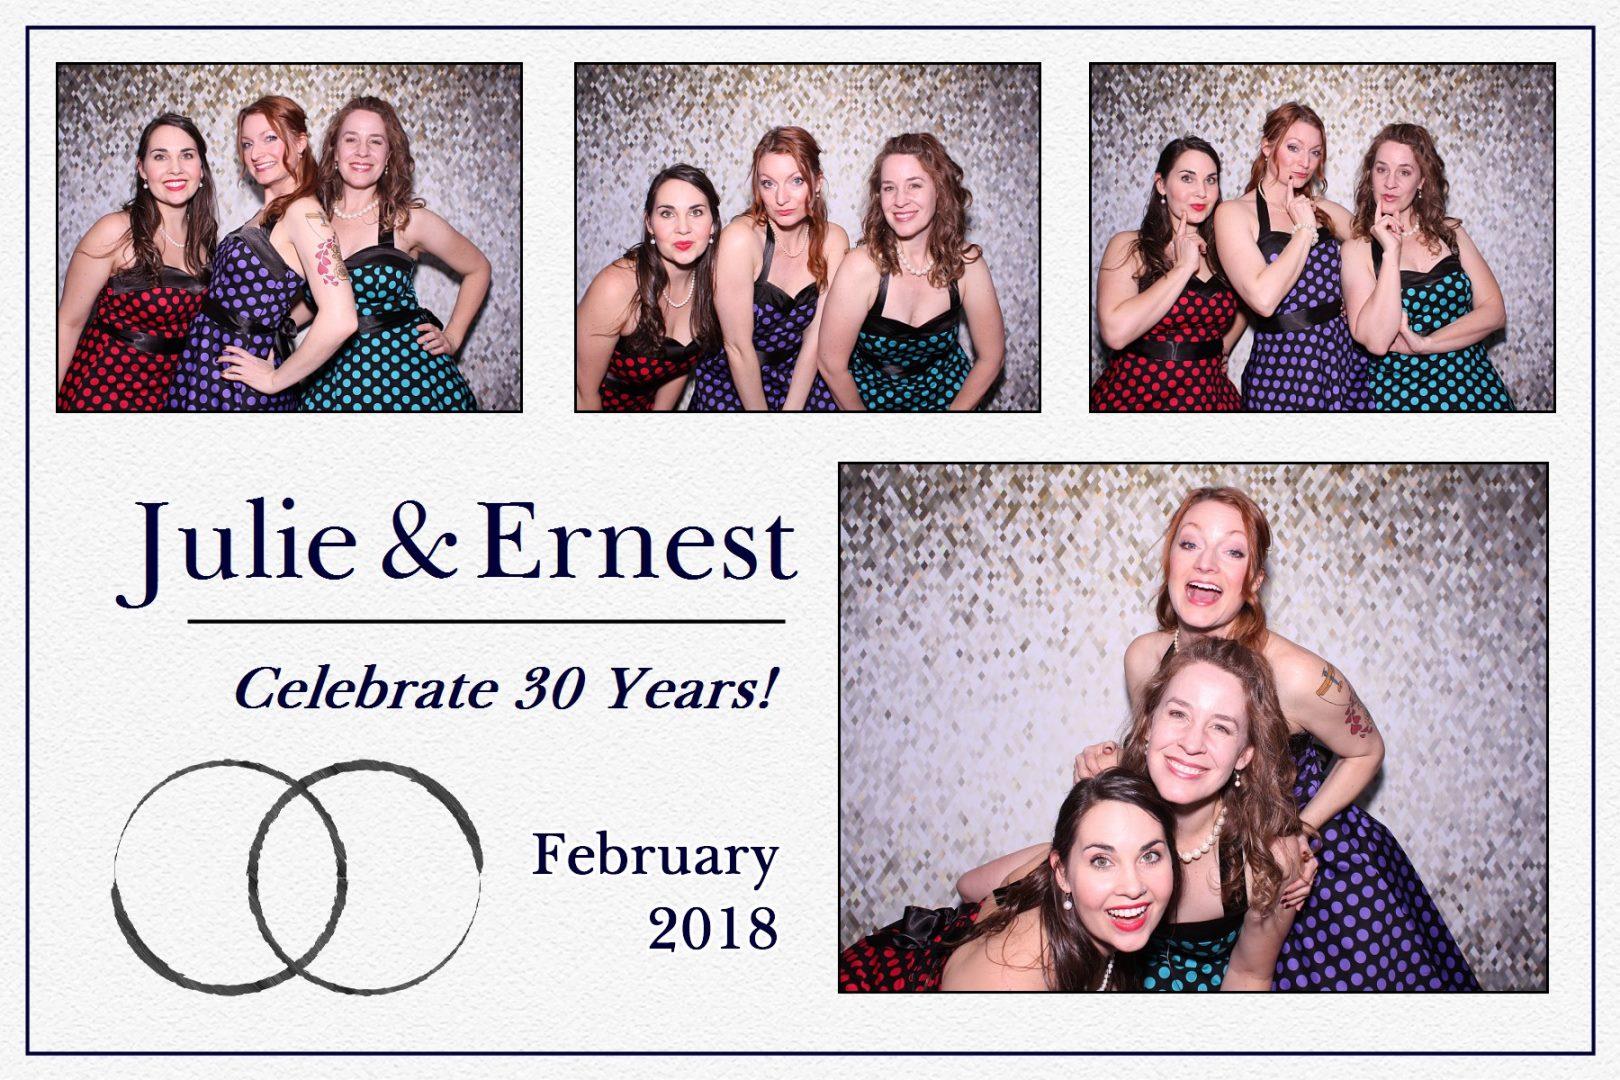 Julie & Ernest 30th Anni Photo Booth 4x6 example.jpg